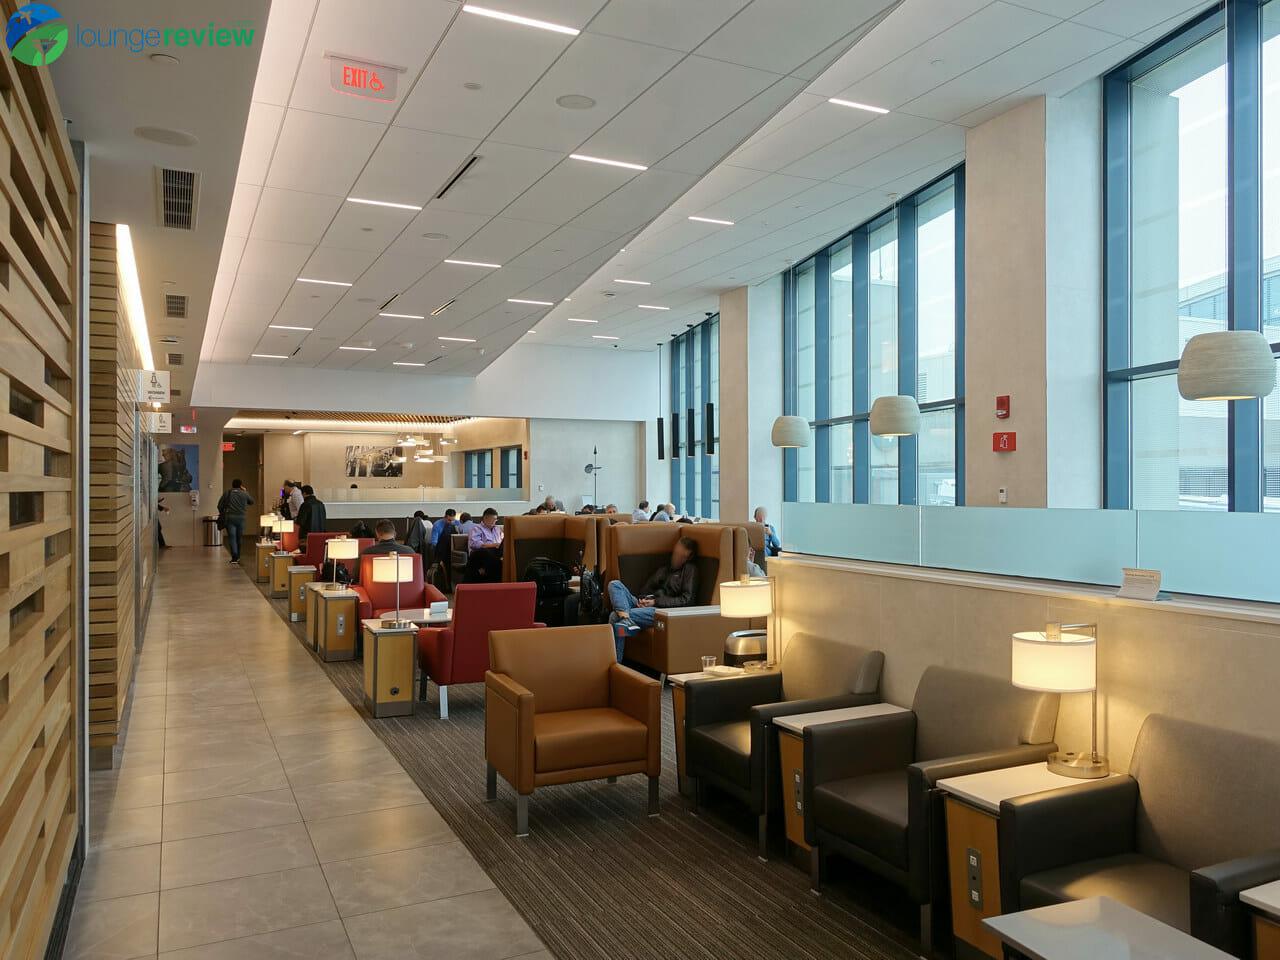 American Airlines Admirals Club - Boston, MA (BOS)